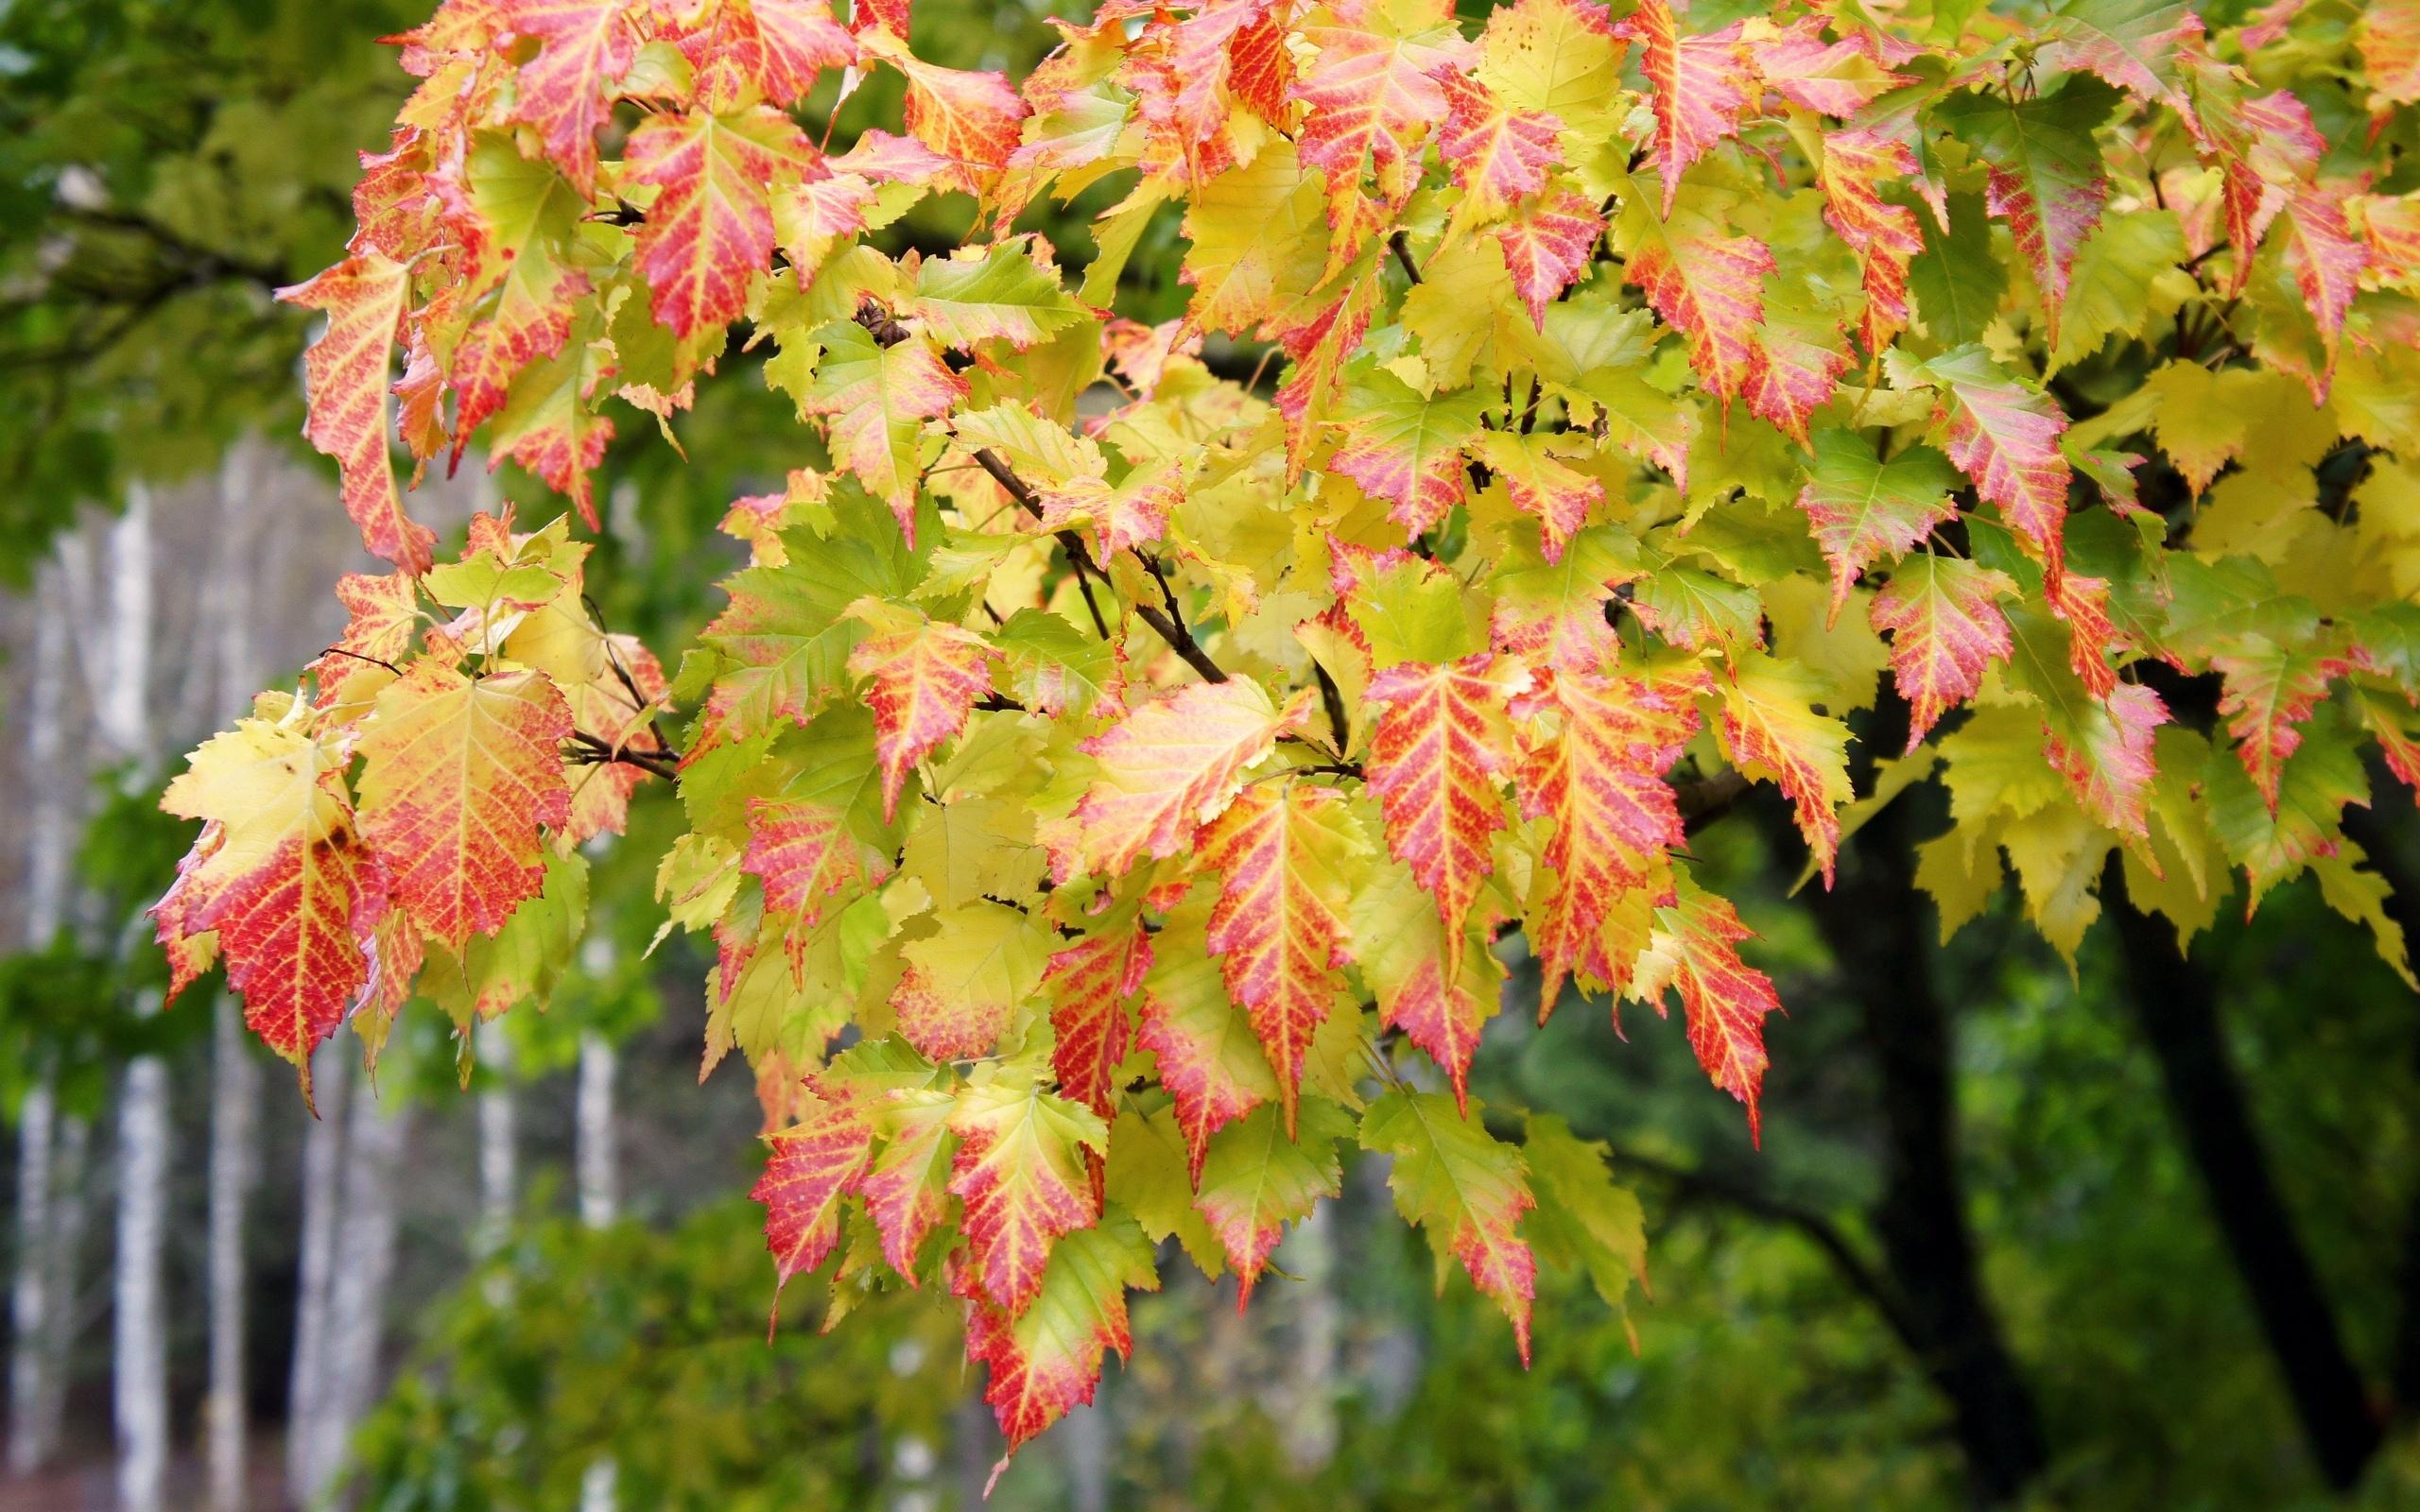 Handy-Wallpaper Pflanzen, Bäume, Herbst, Blätter kostenlos herunterladen.